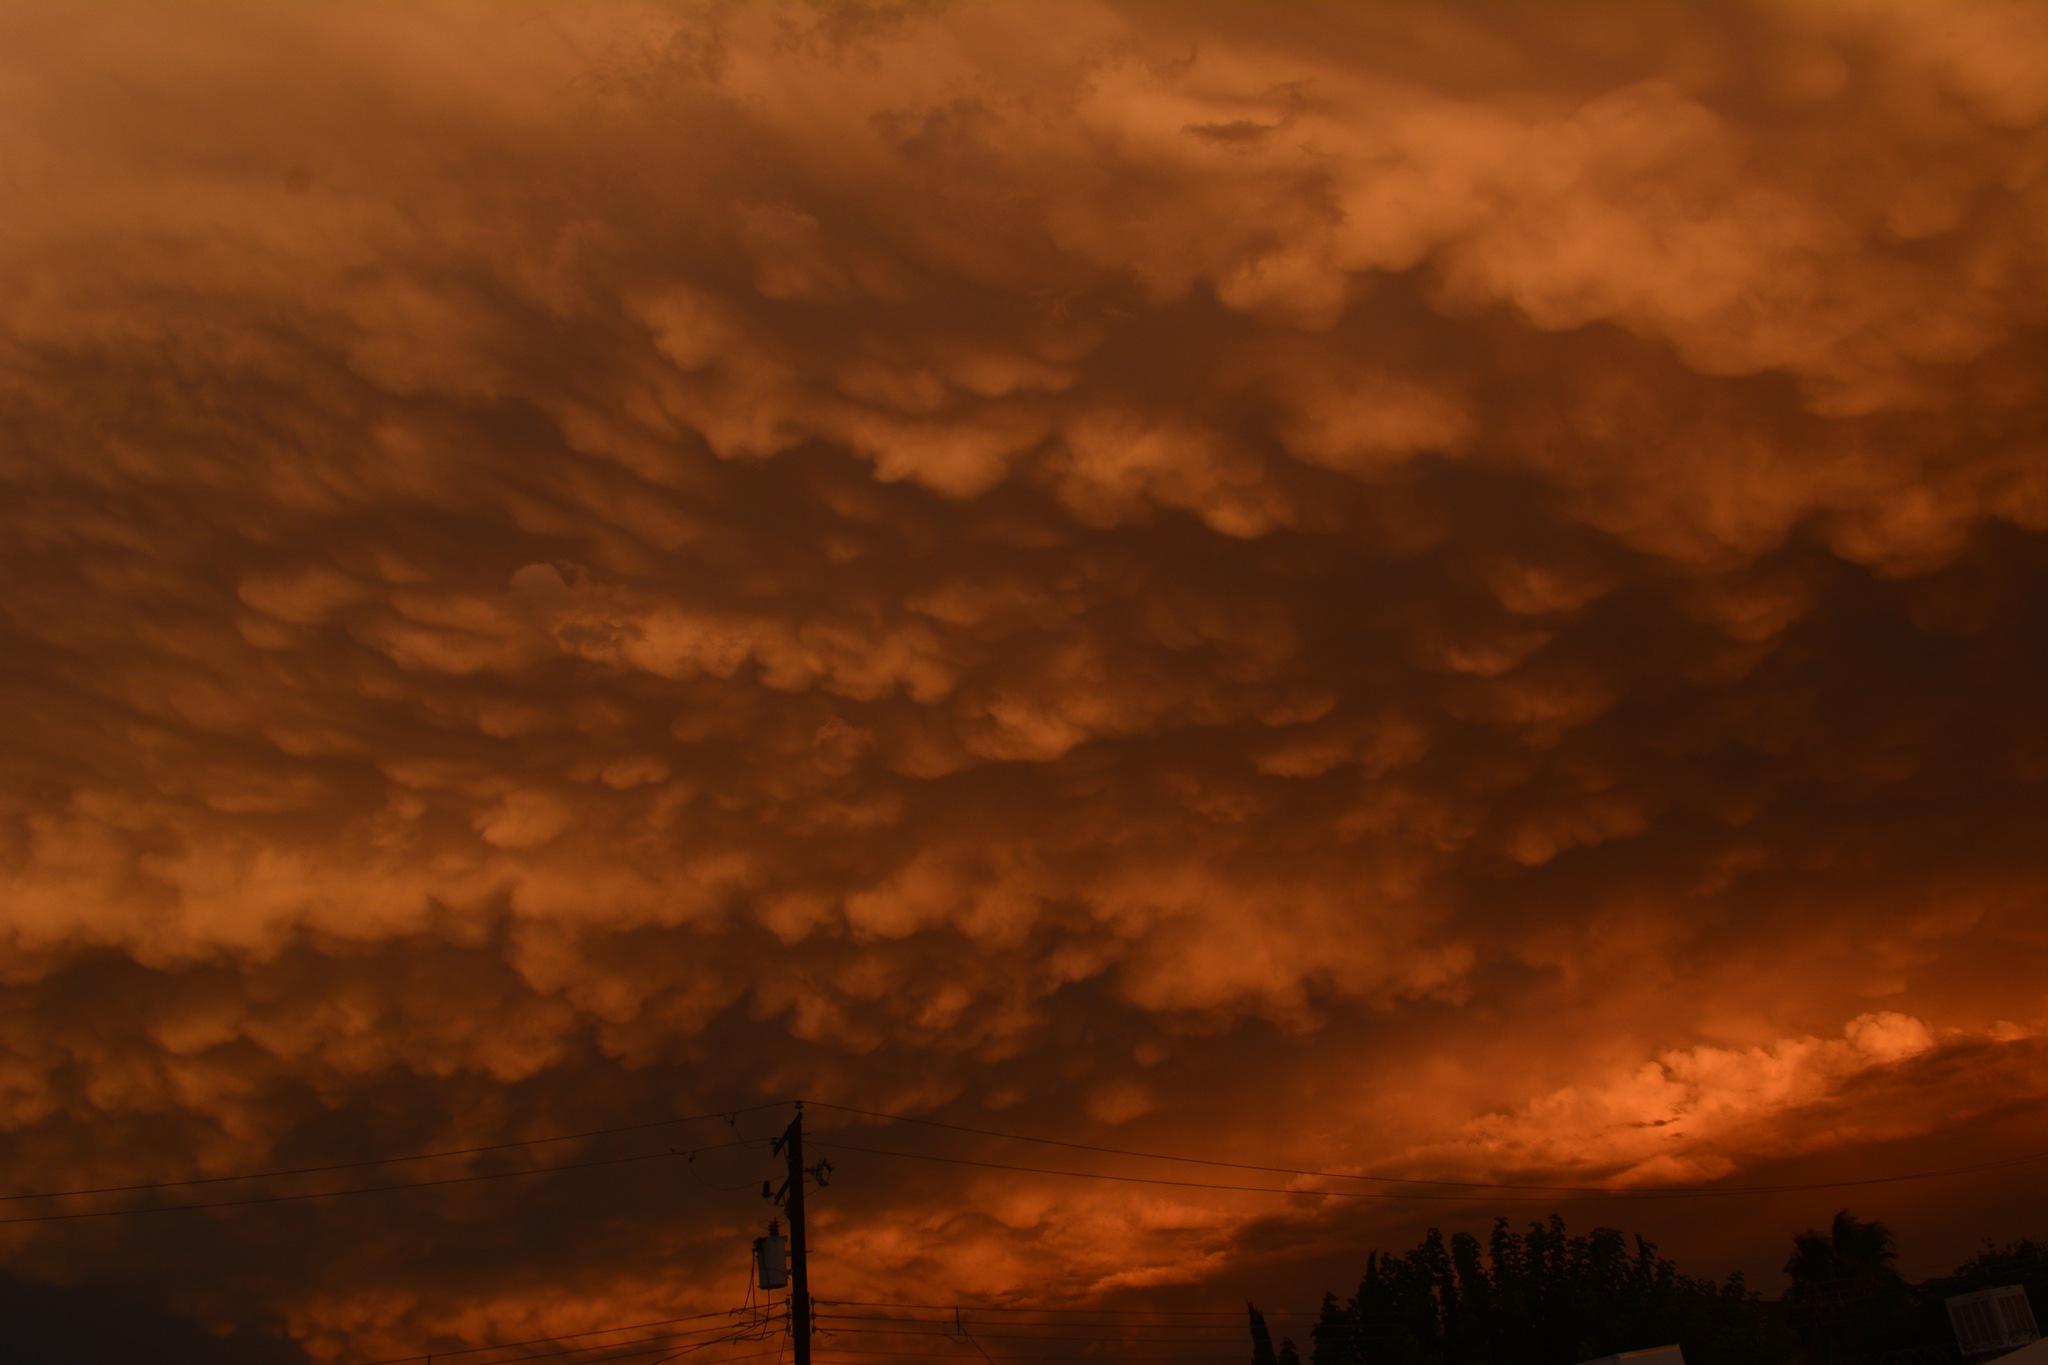 Mexican Sky by RayzaKleiber